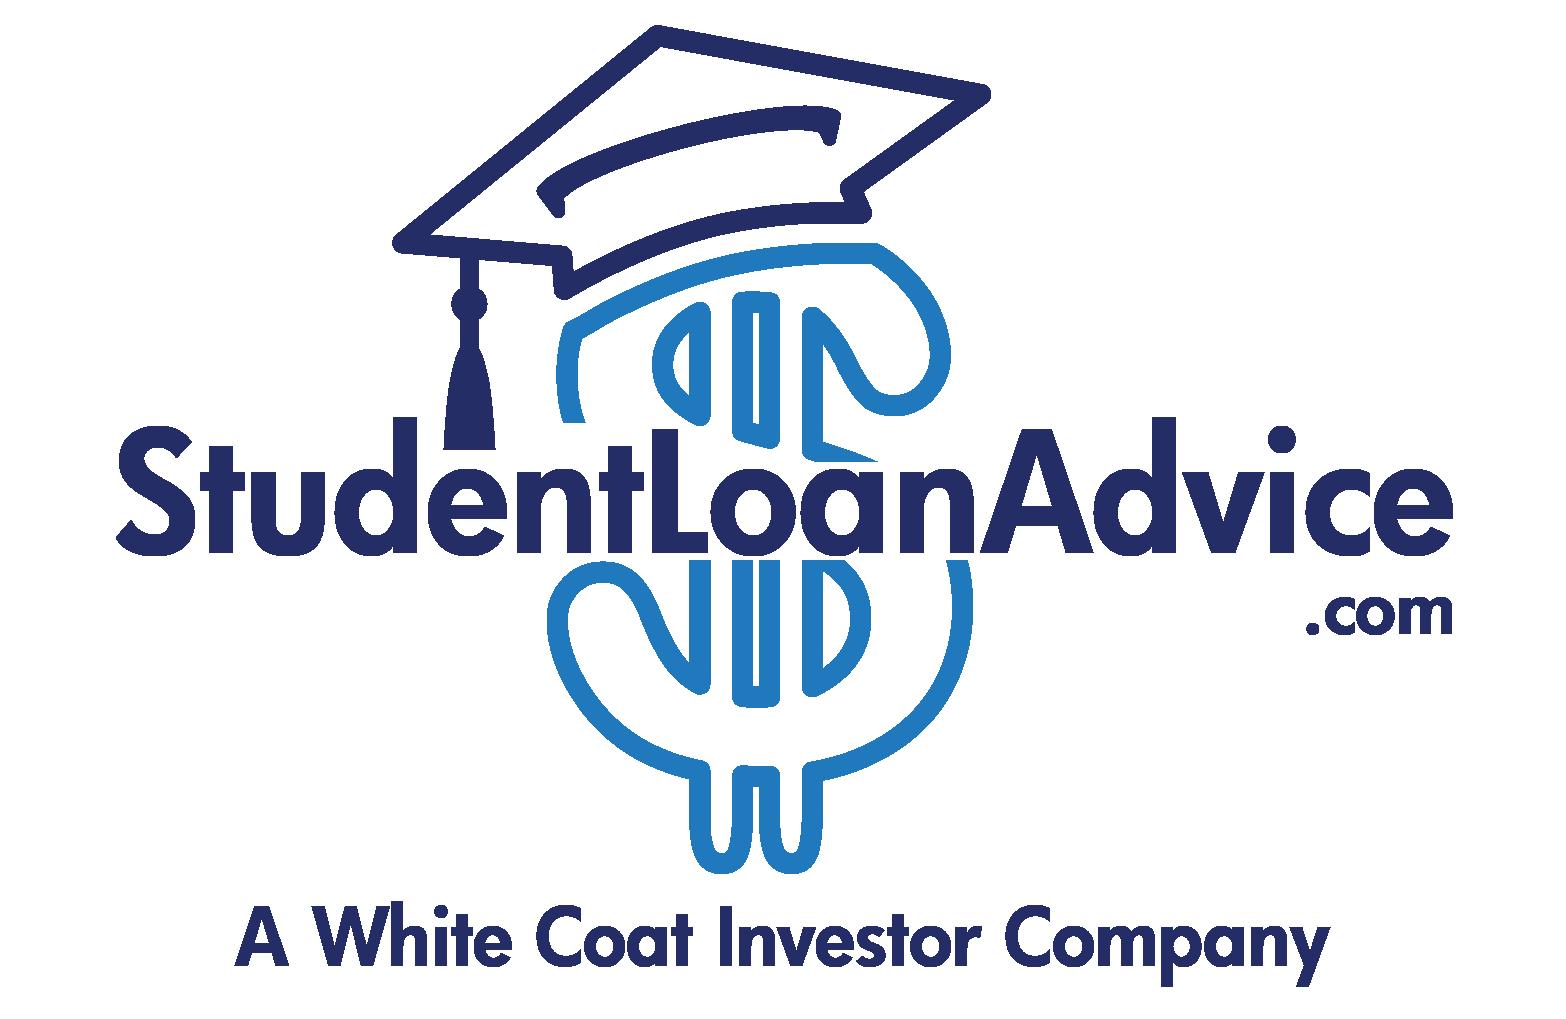 StudentLoanAdvice